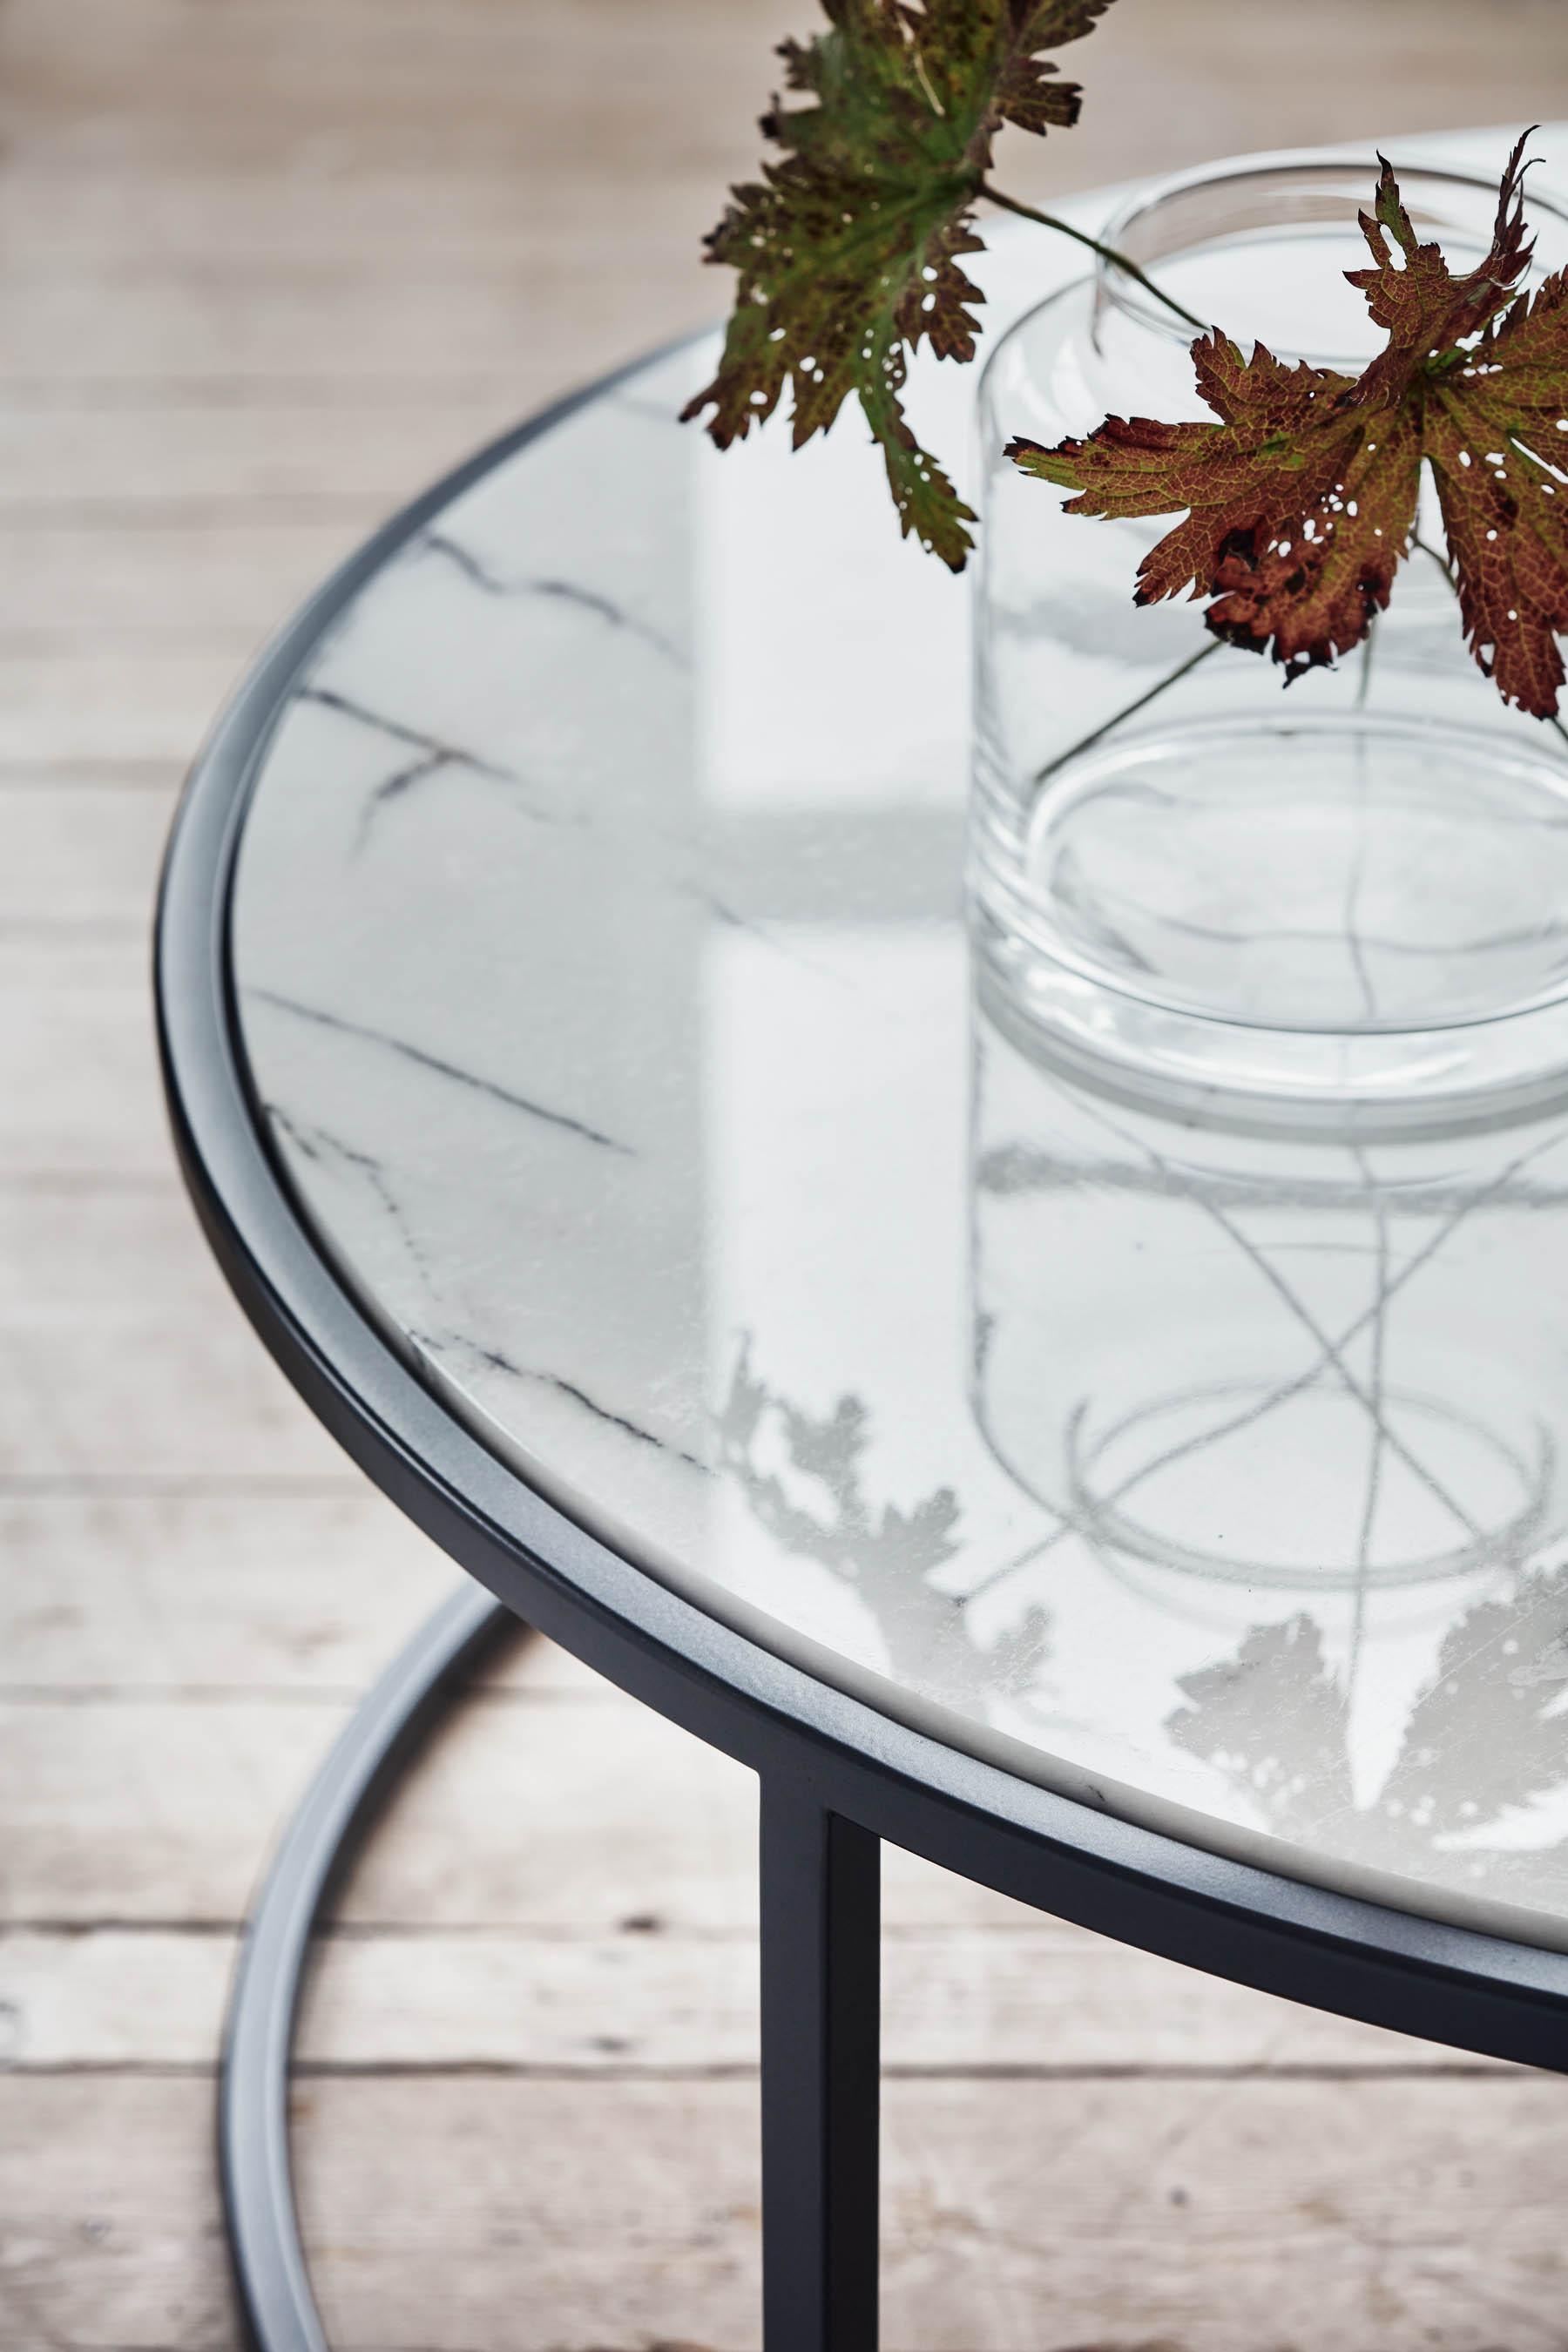 Siena Rnd Coffee Table Detial 01